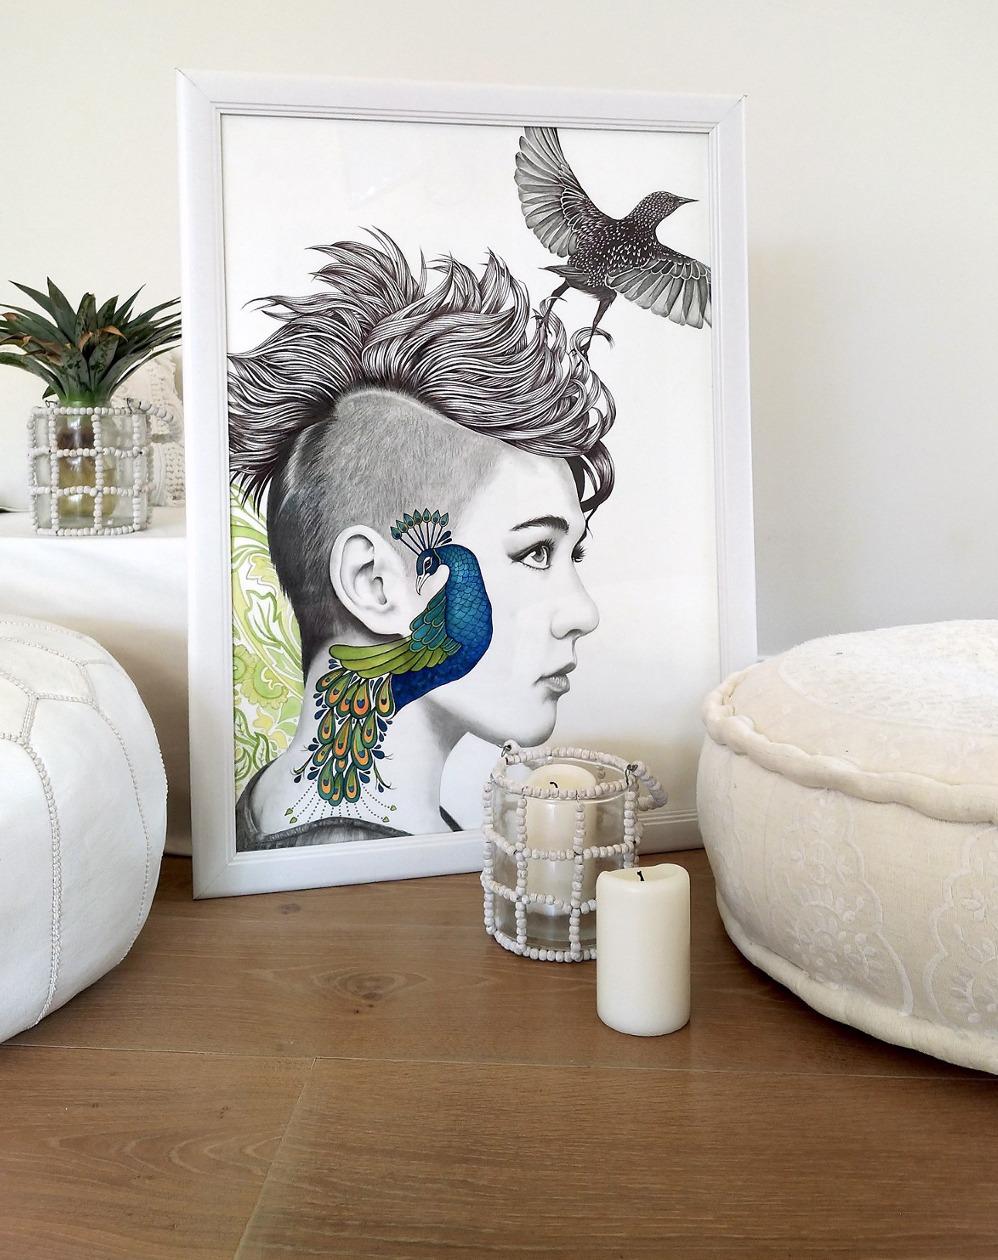 Photoshoot of finished Kati Designs artworks